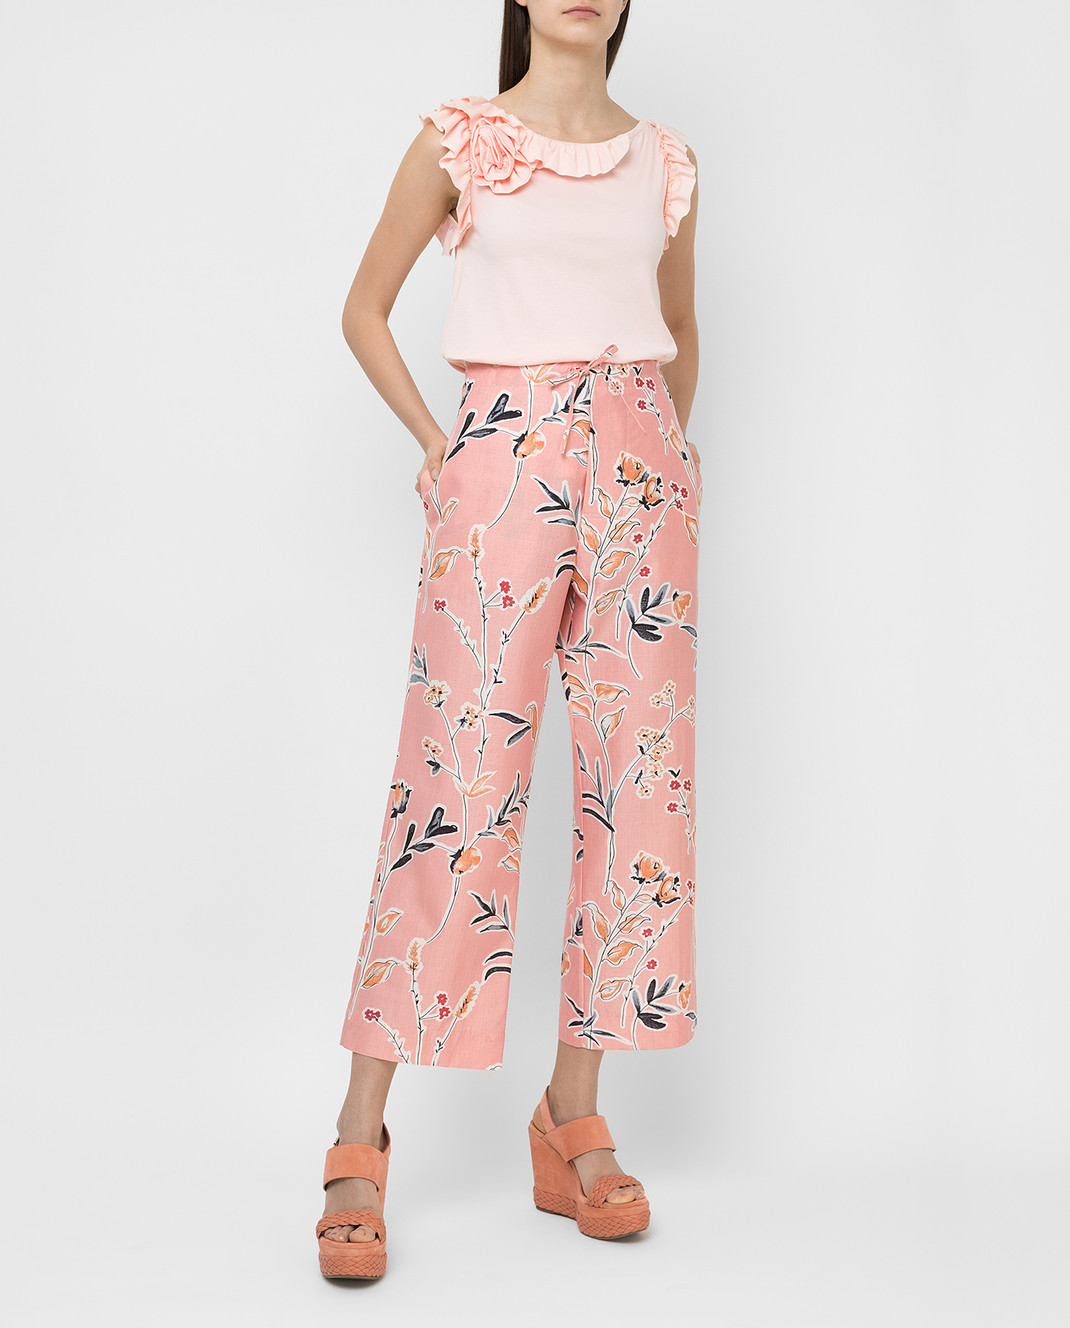 Marni Розовые брюки PAMAR02A00TCR58 изображение 2